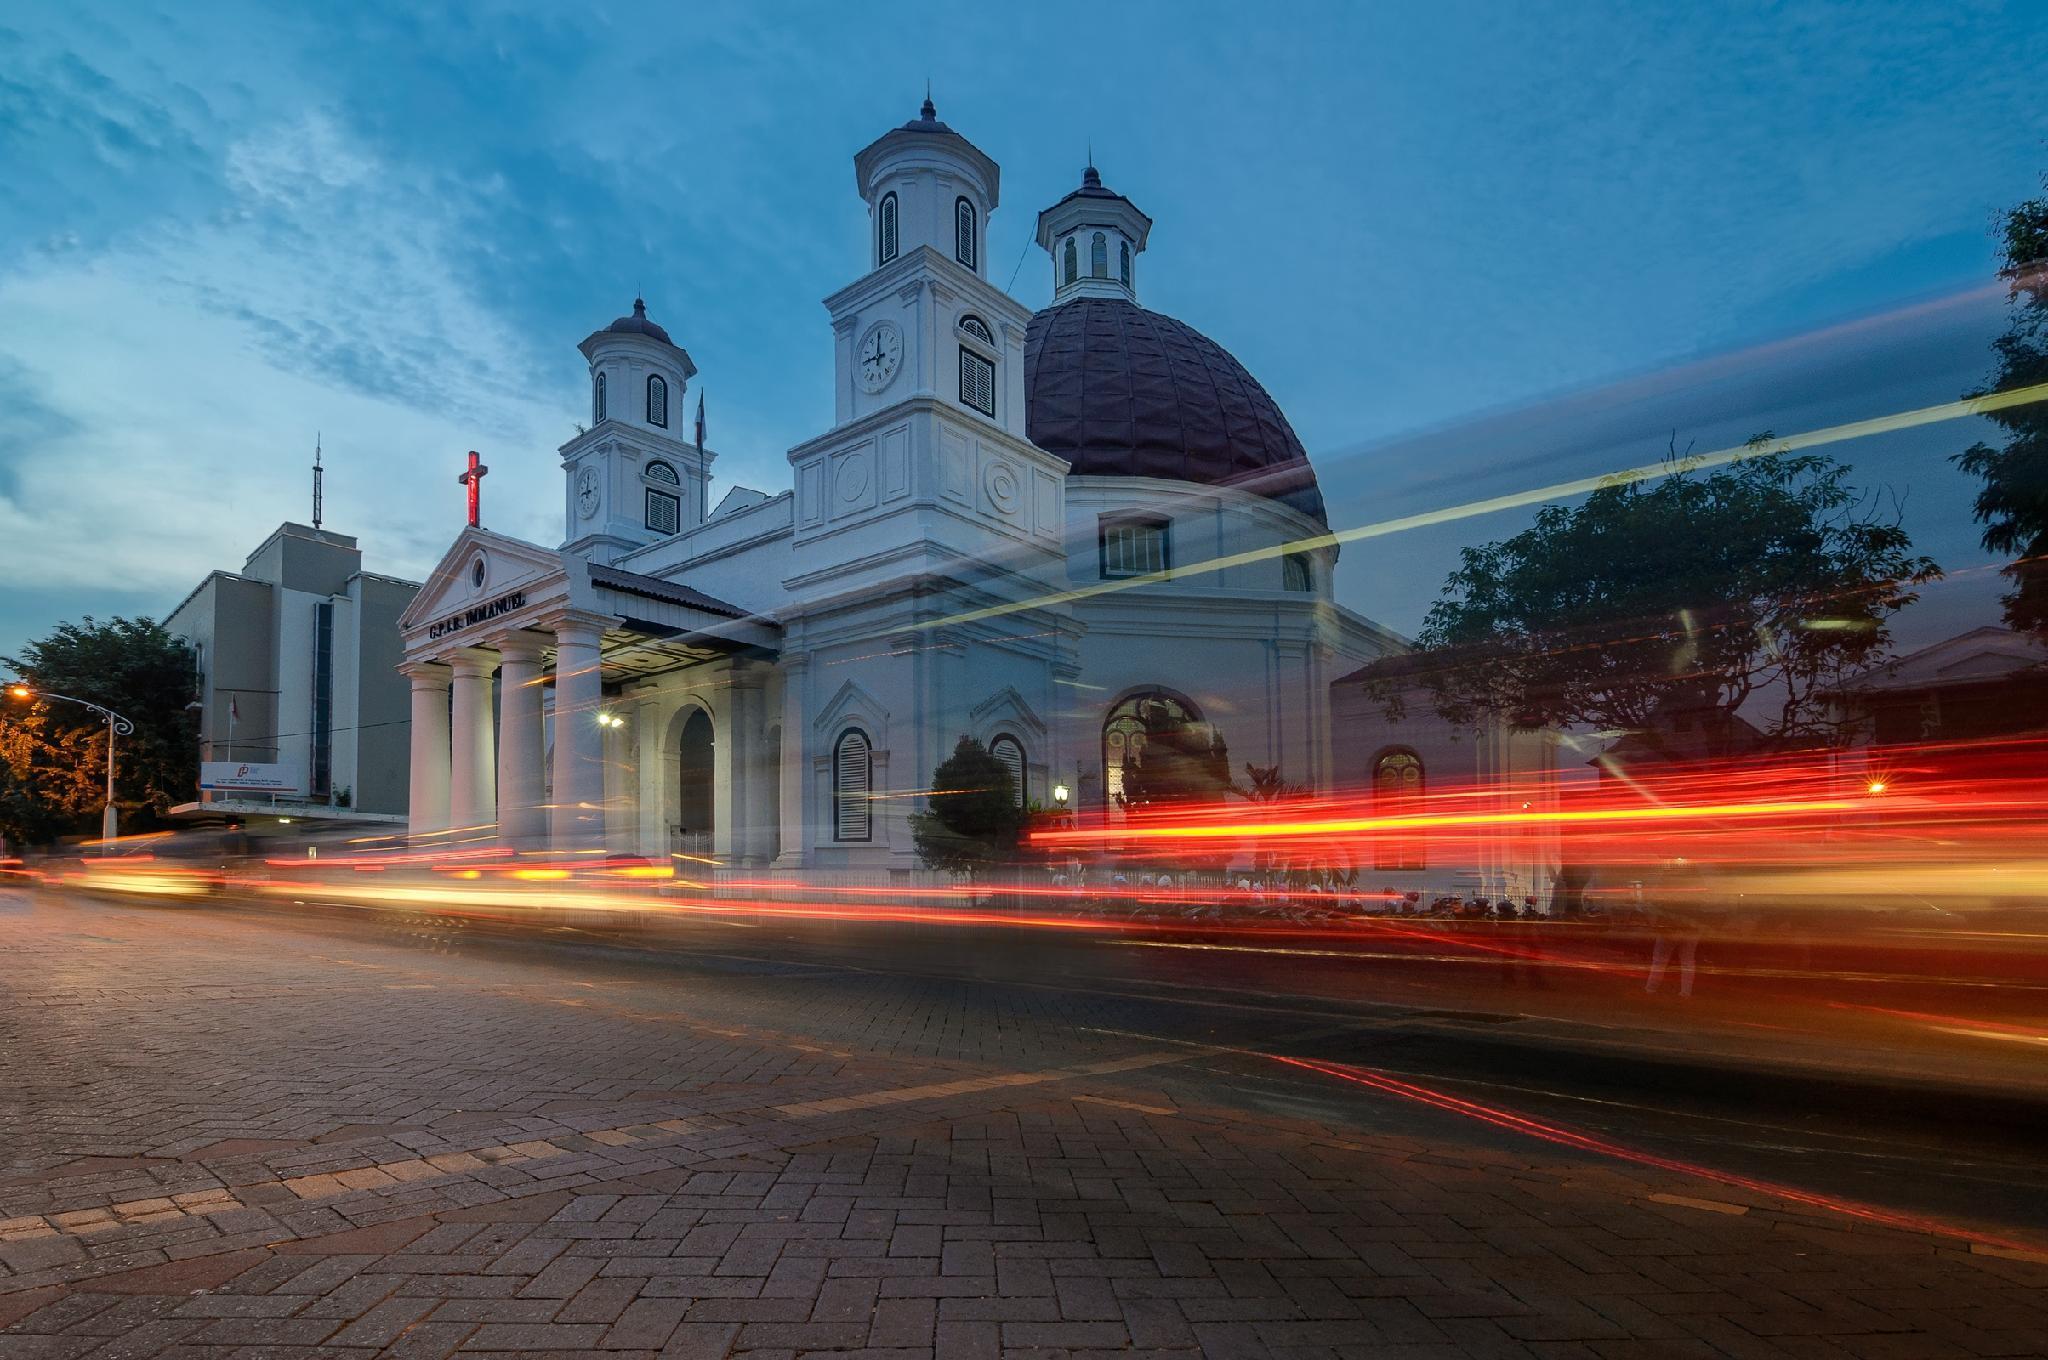 Rumah Singgah Griya H47, Semarang